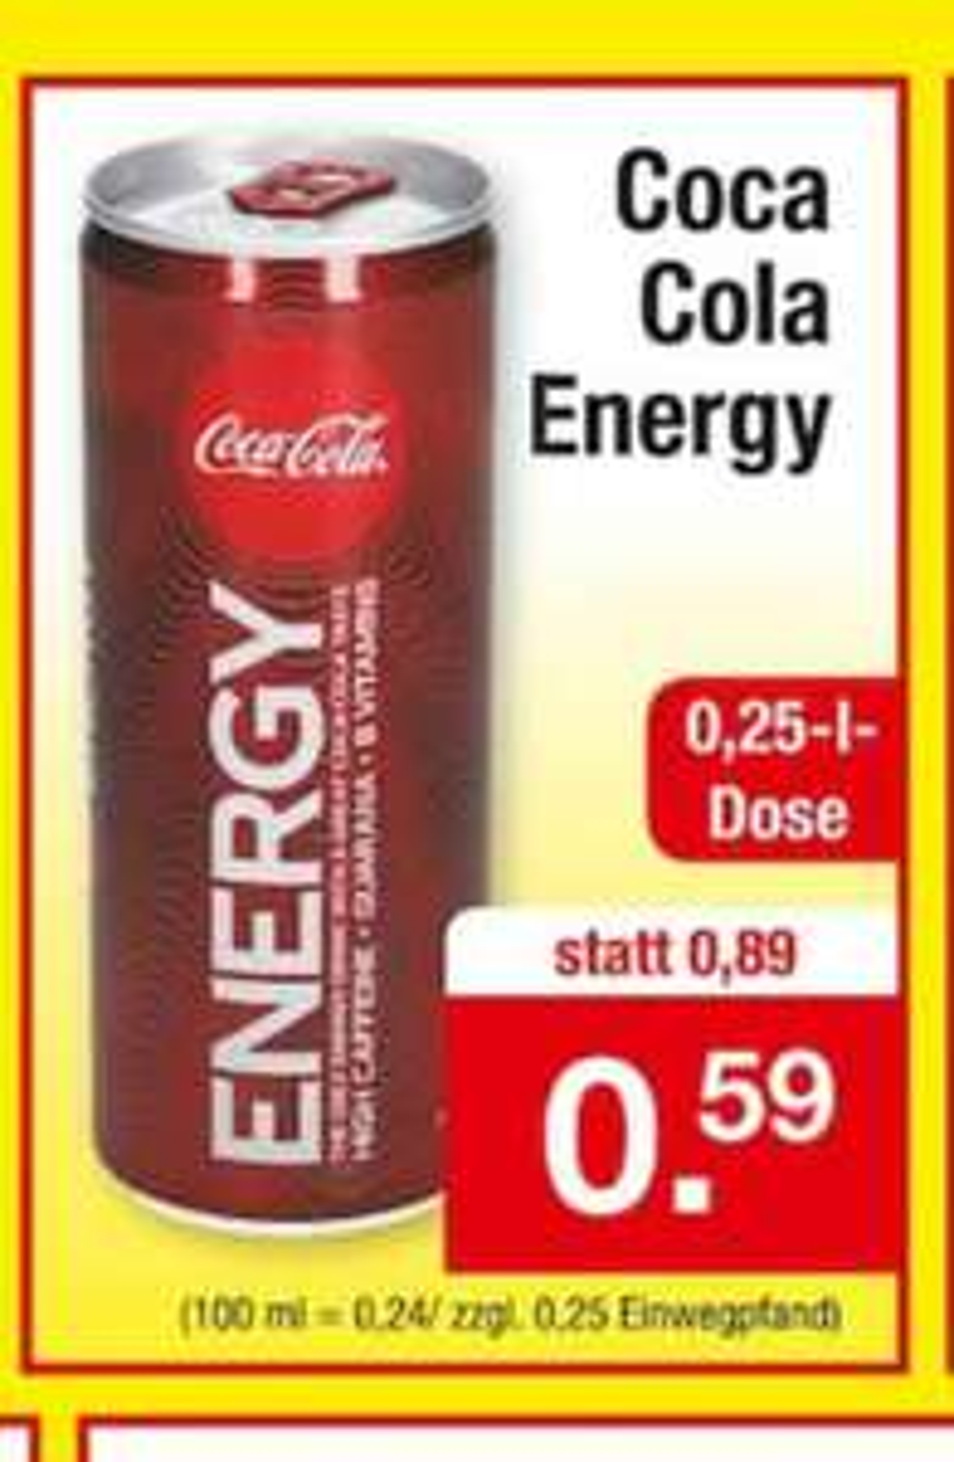 Coca Cola Energy 0,59 Euro